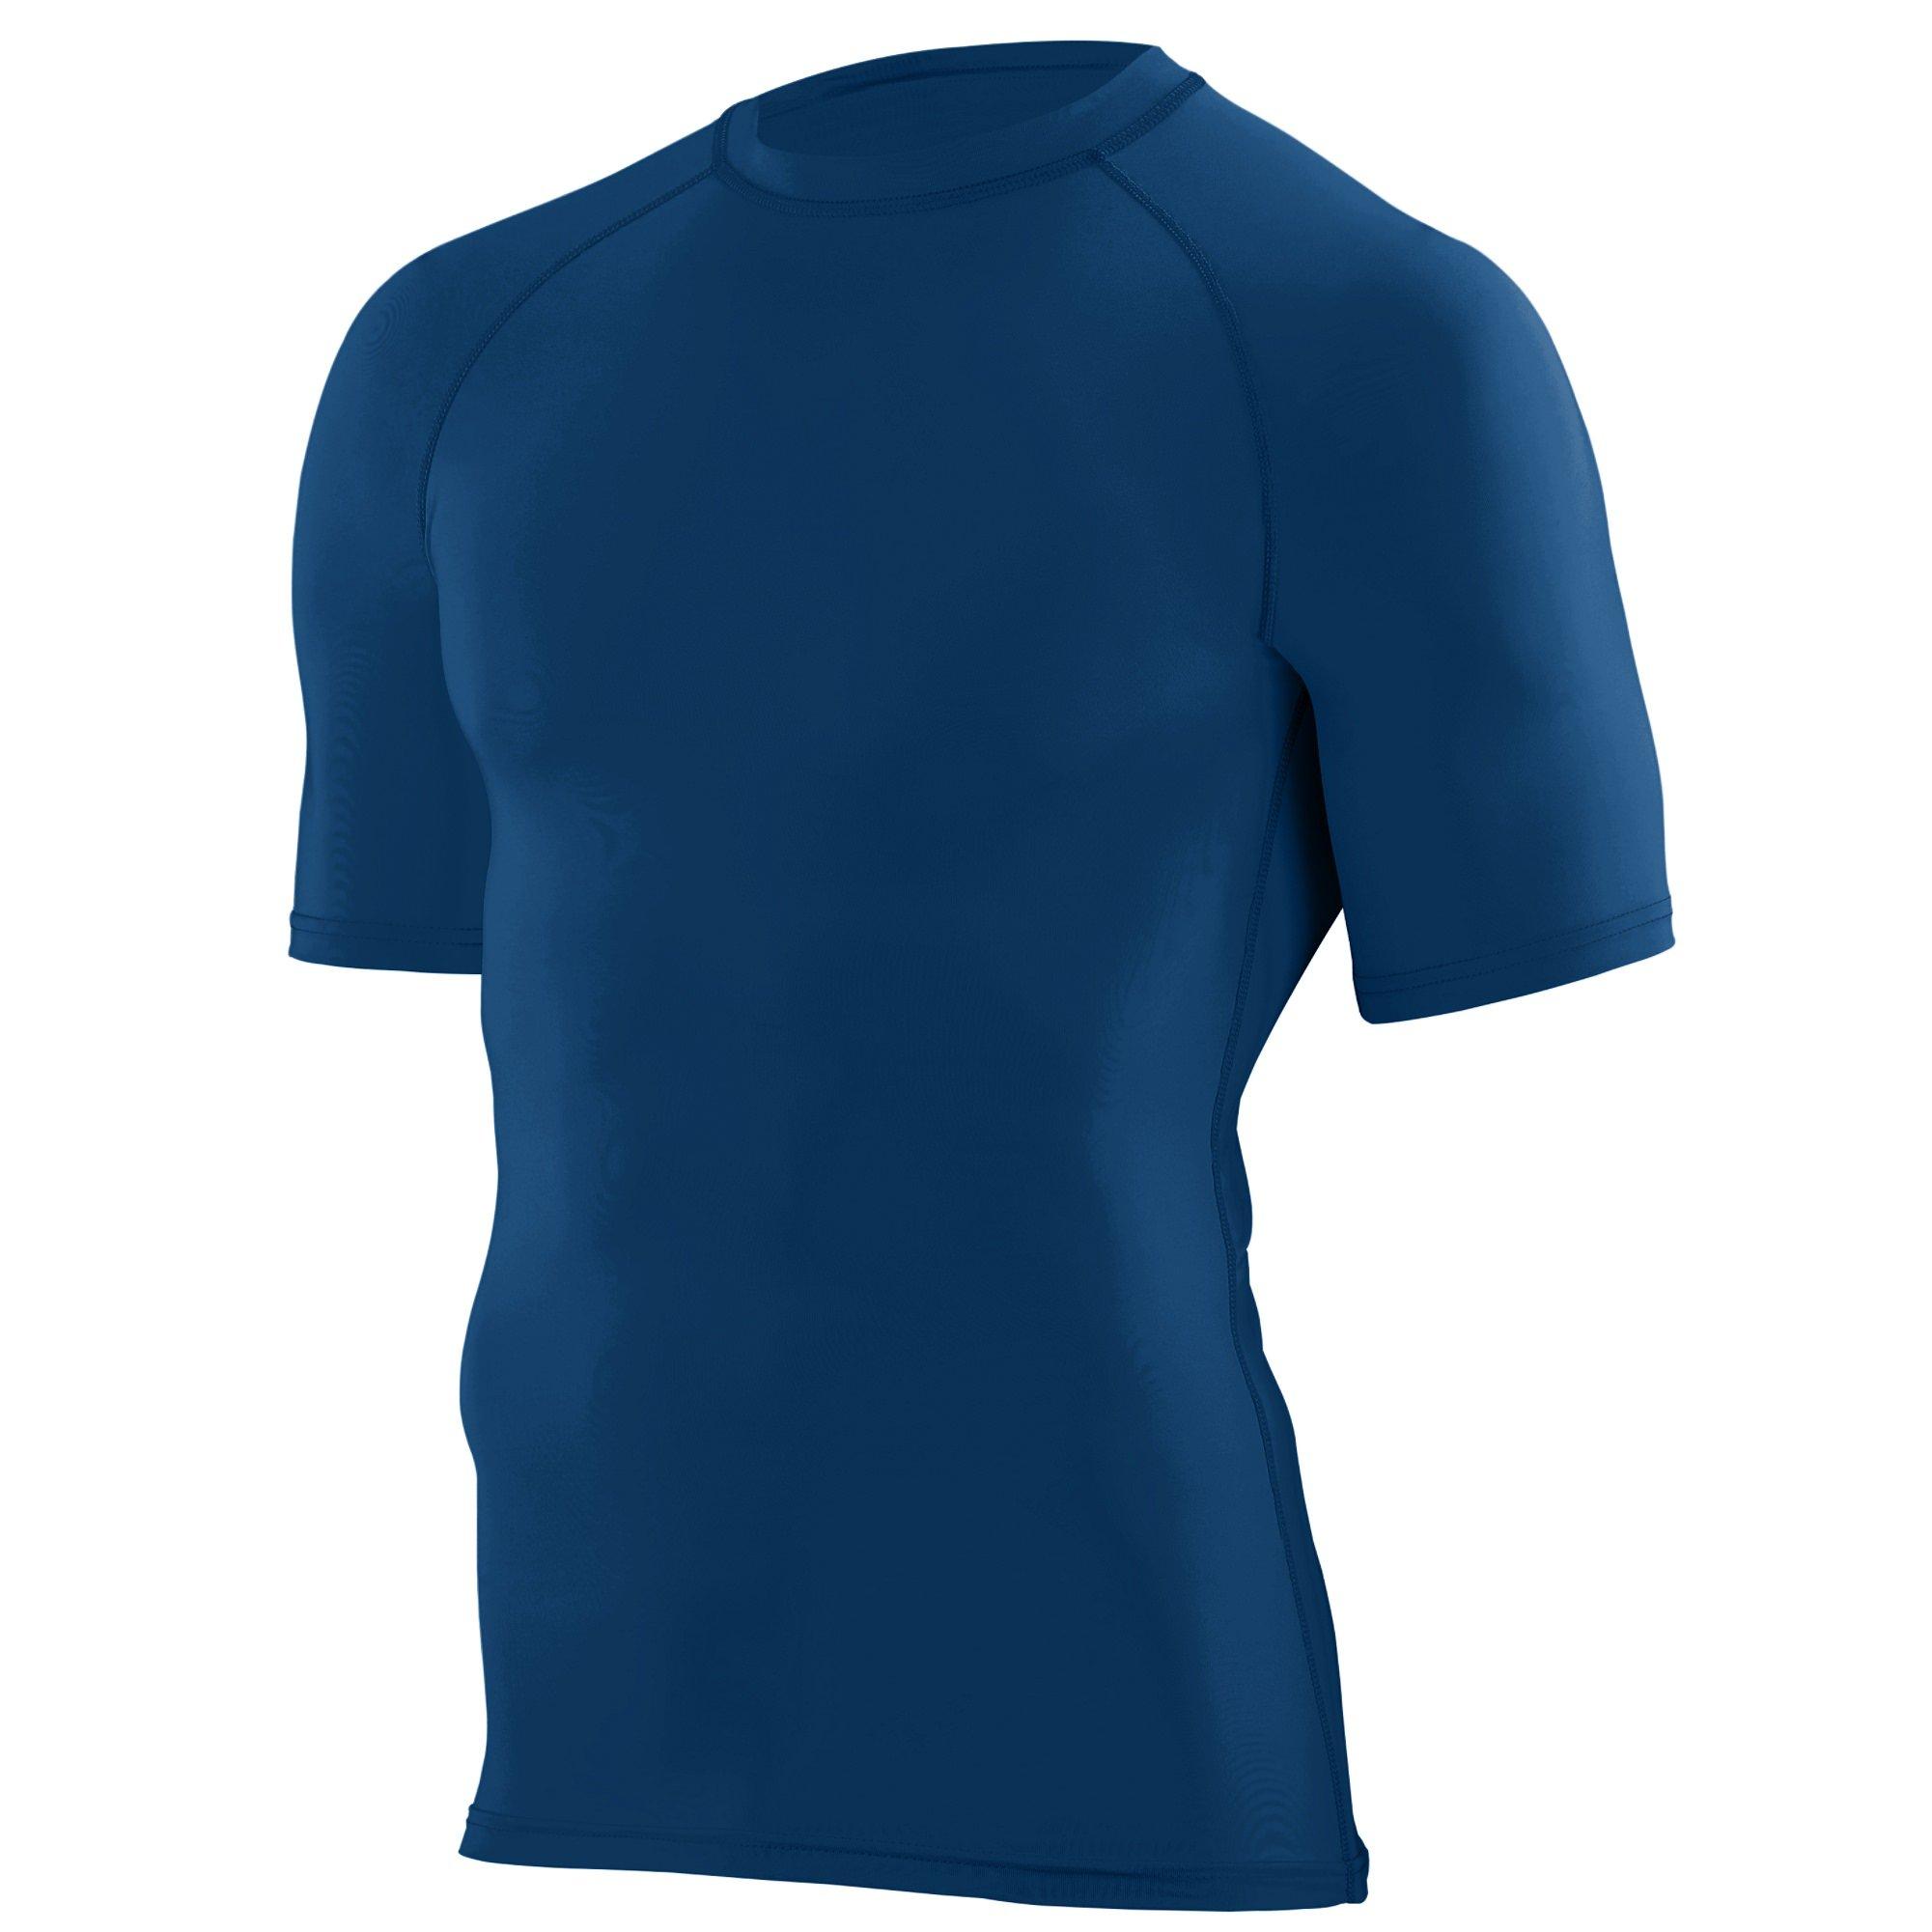 Augusta Sportswear Boys' Hyperform Compression Short Sleeve Shirt S Navy